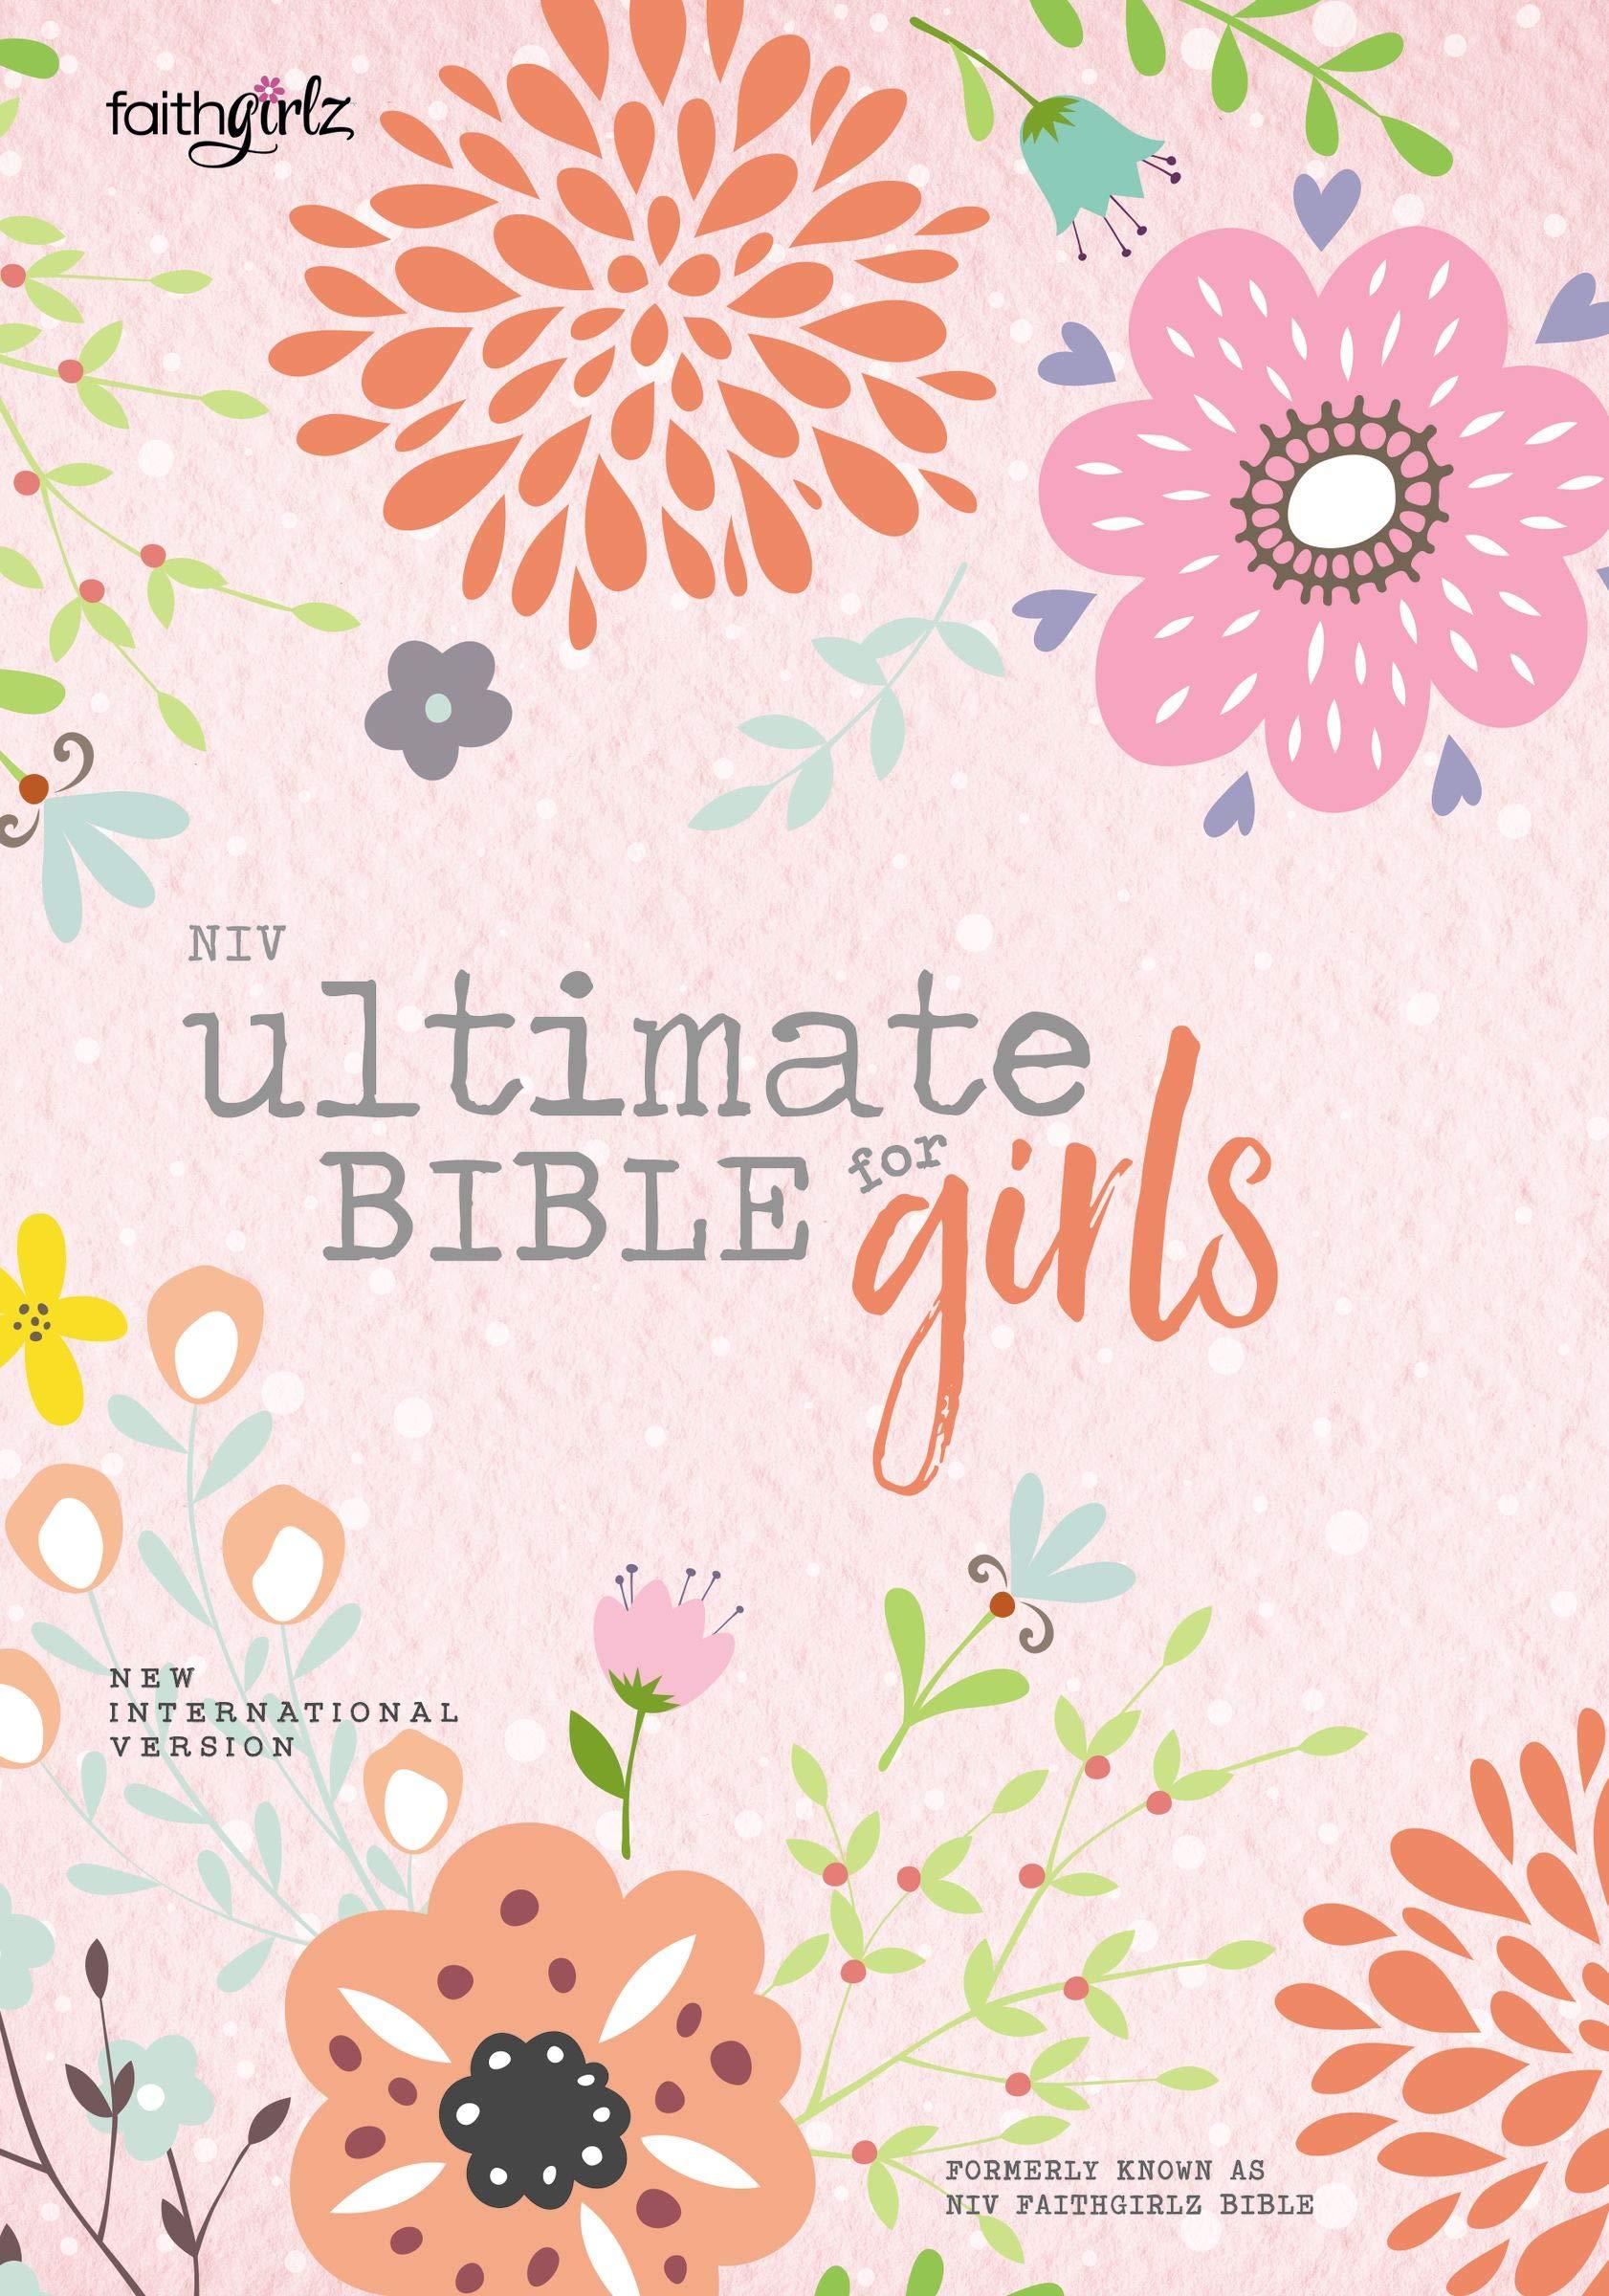 NIV, Ultimate Bible for Girls, Faithgirlz Edition, Hardcover